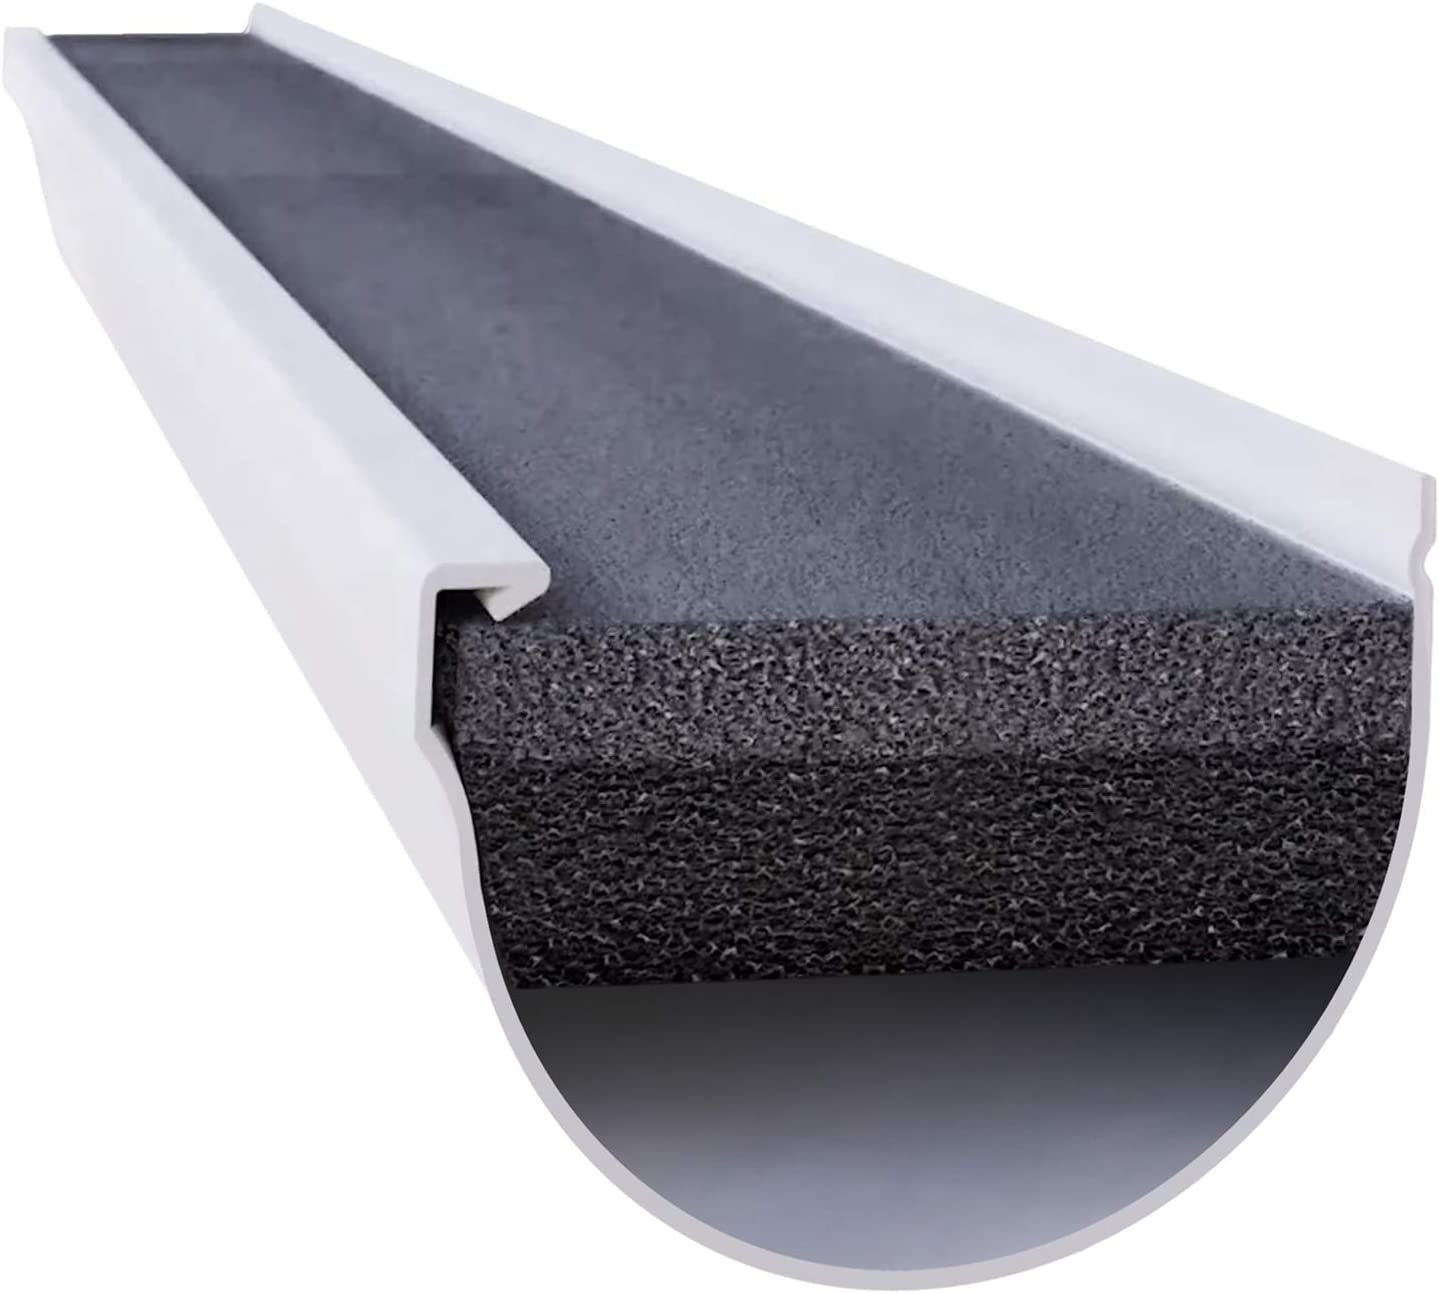 GutterStuff Pro 4-Inch Half Round Style Foam Gutter Filter Insert